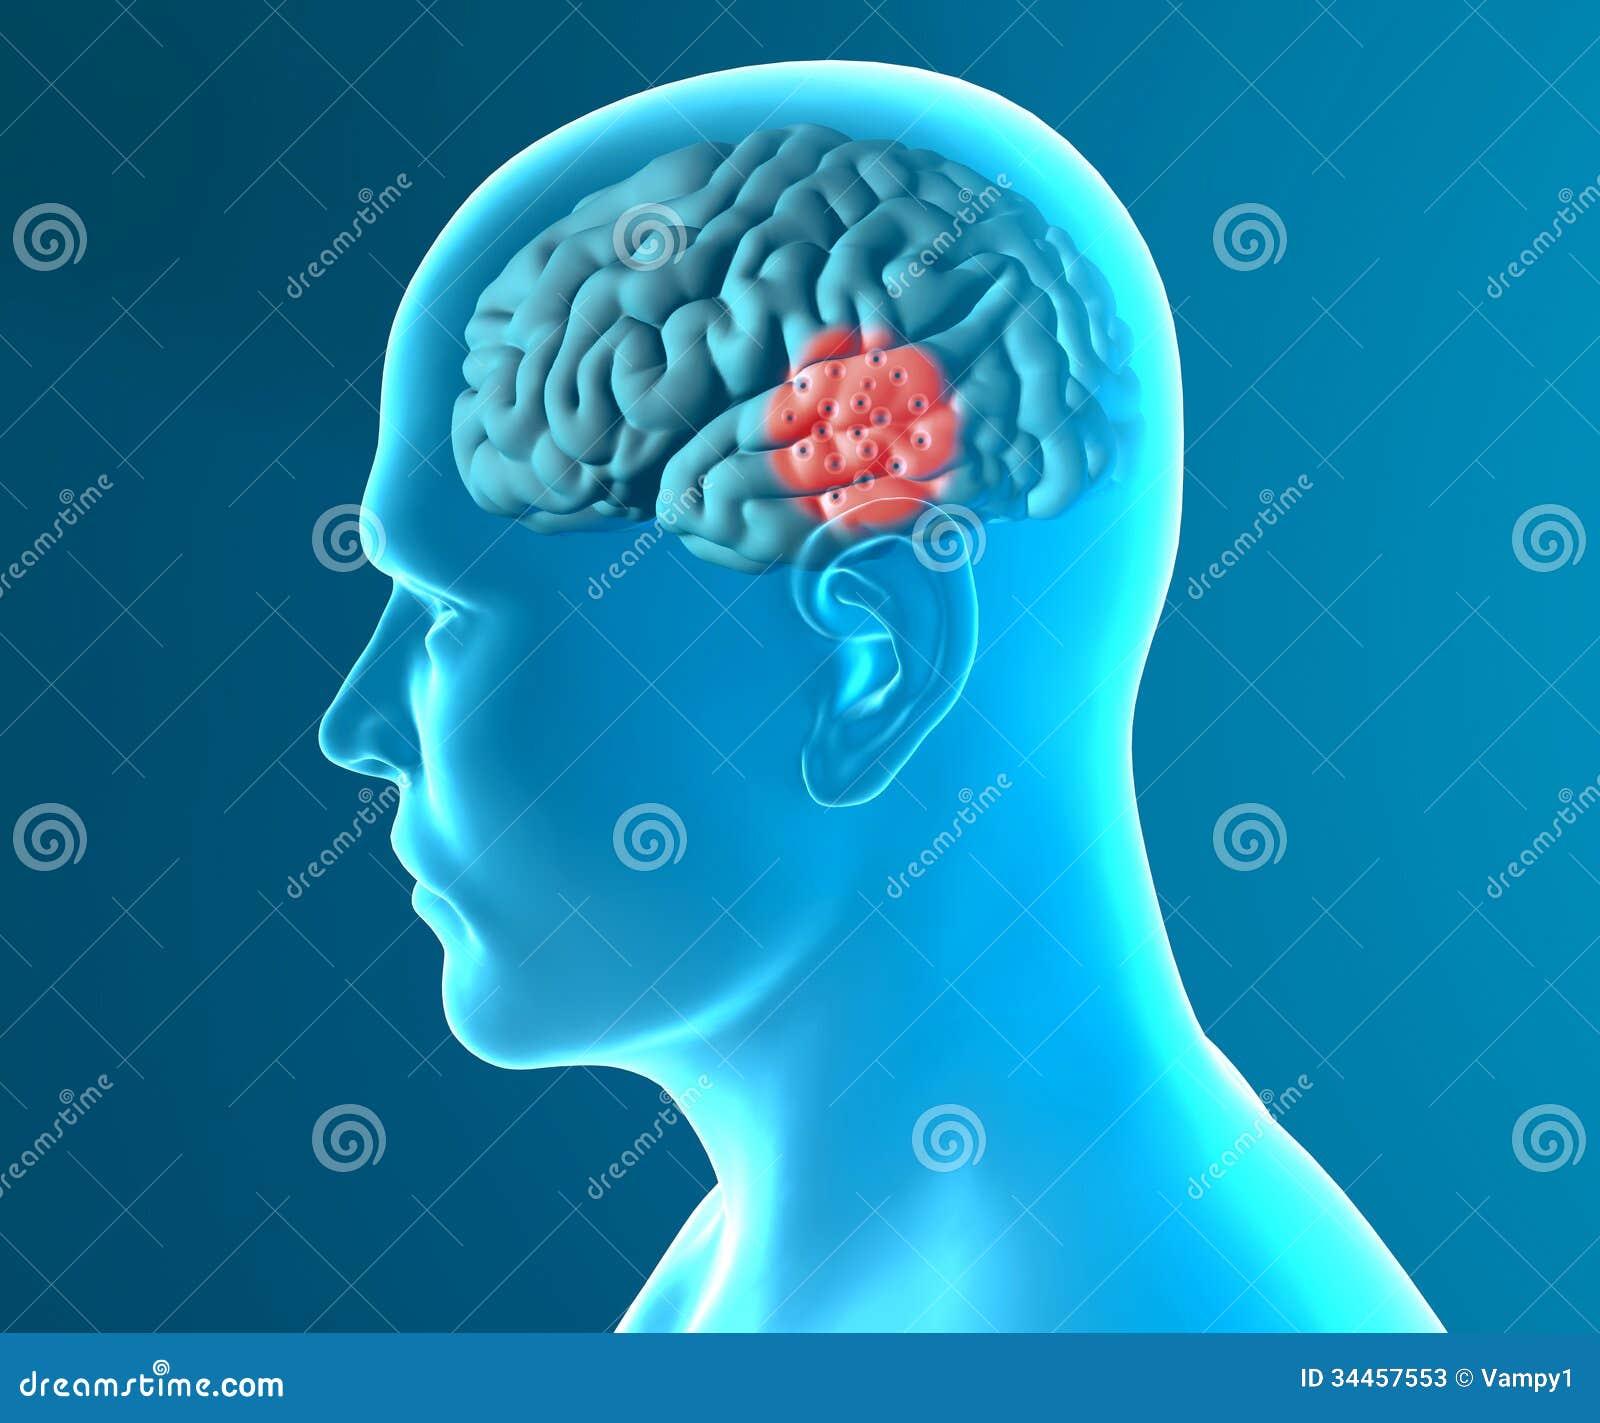 Brainpower РЅРѕРІРѕСЃРёР±РёСЂСЃРє image 1